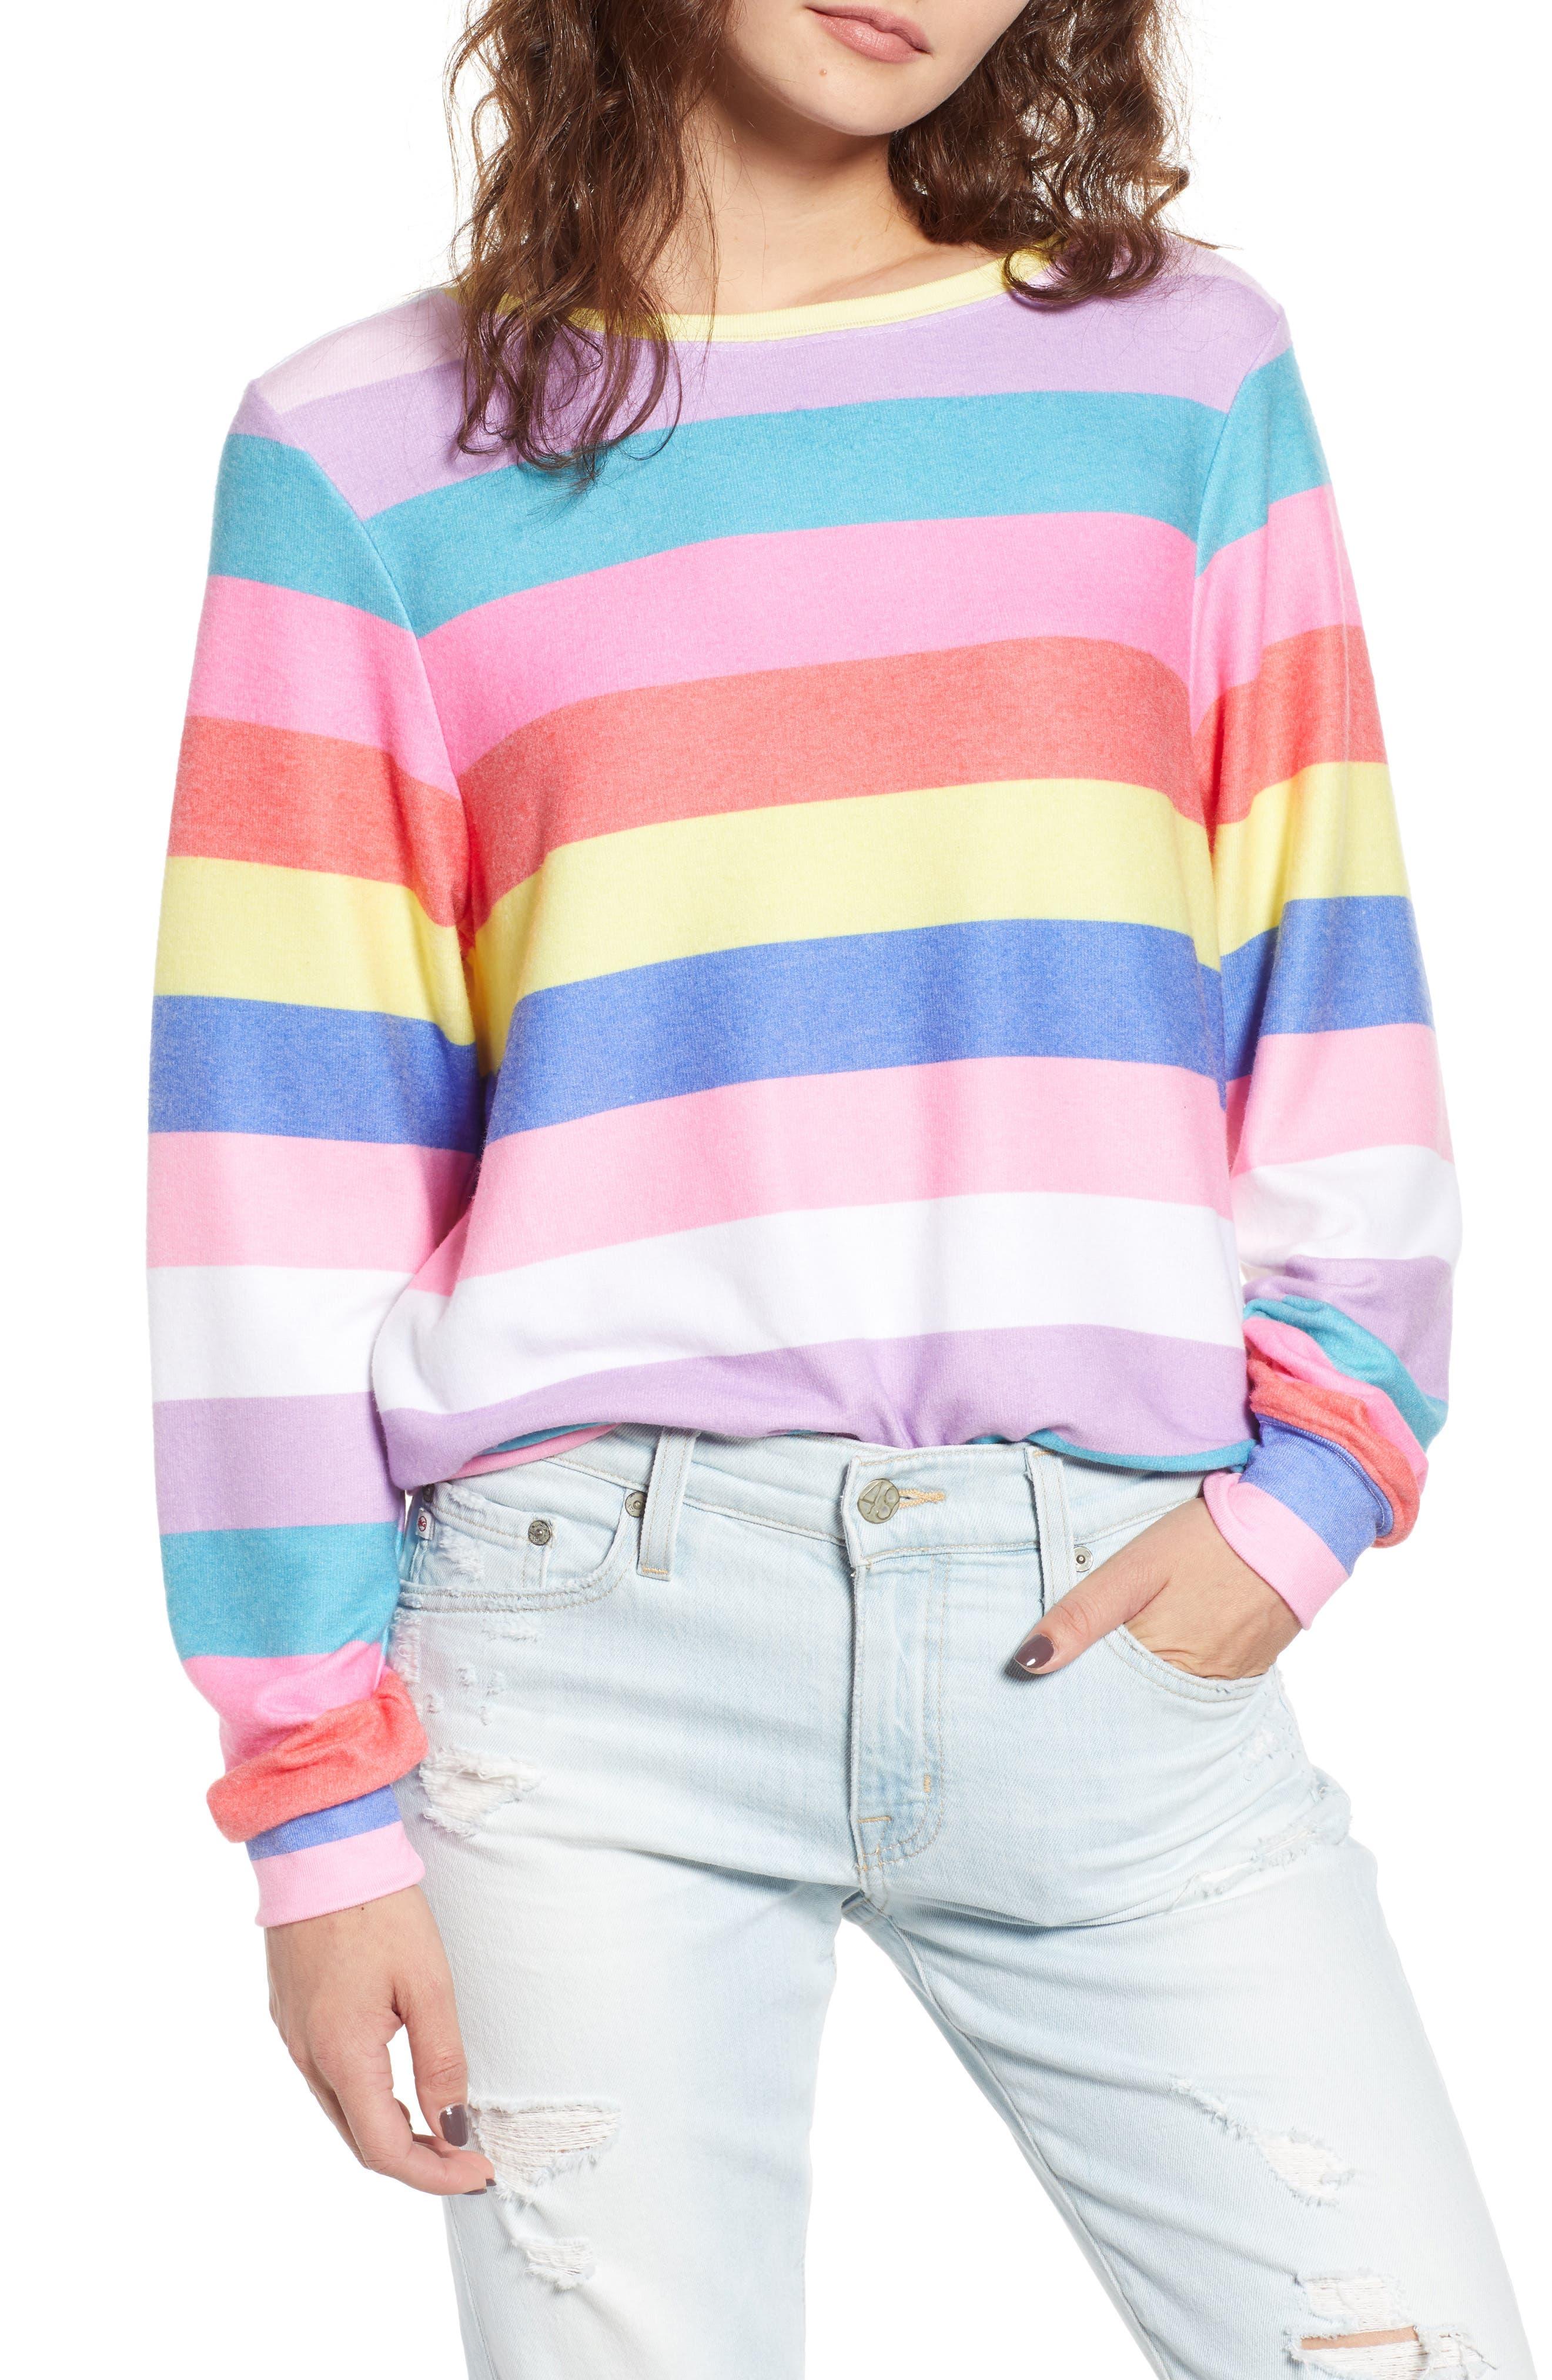 Castaway Roadtrip Sweatshirt,                             Main thumbnail 1, color,                             Multi Colored